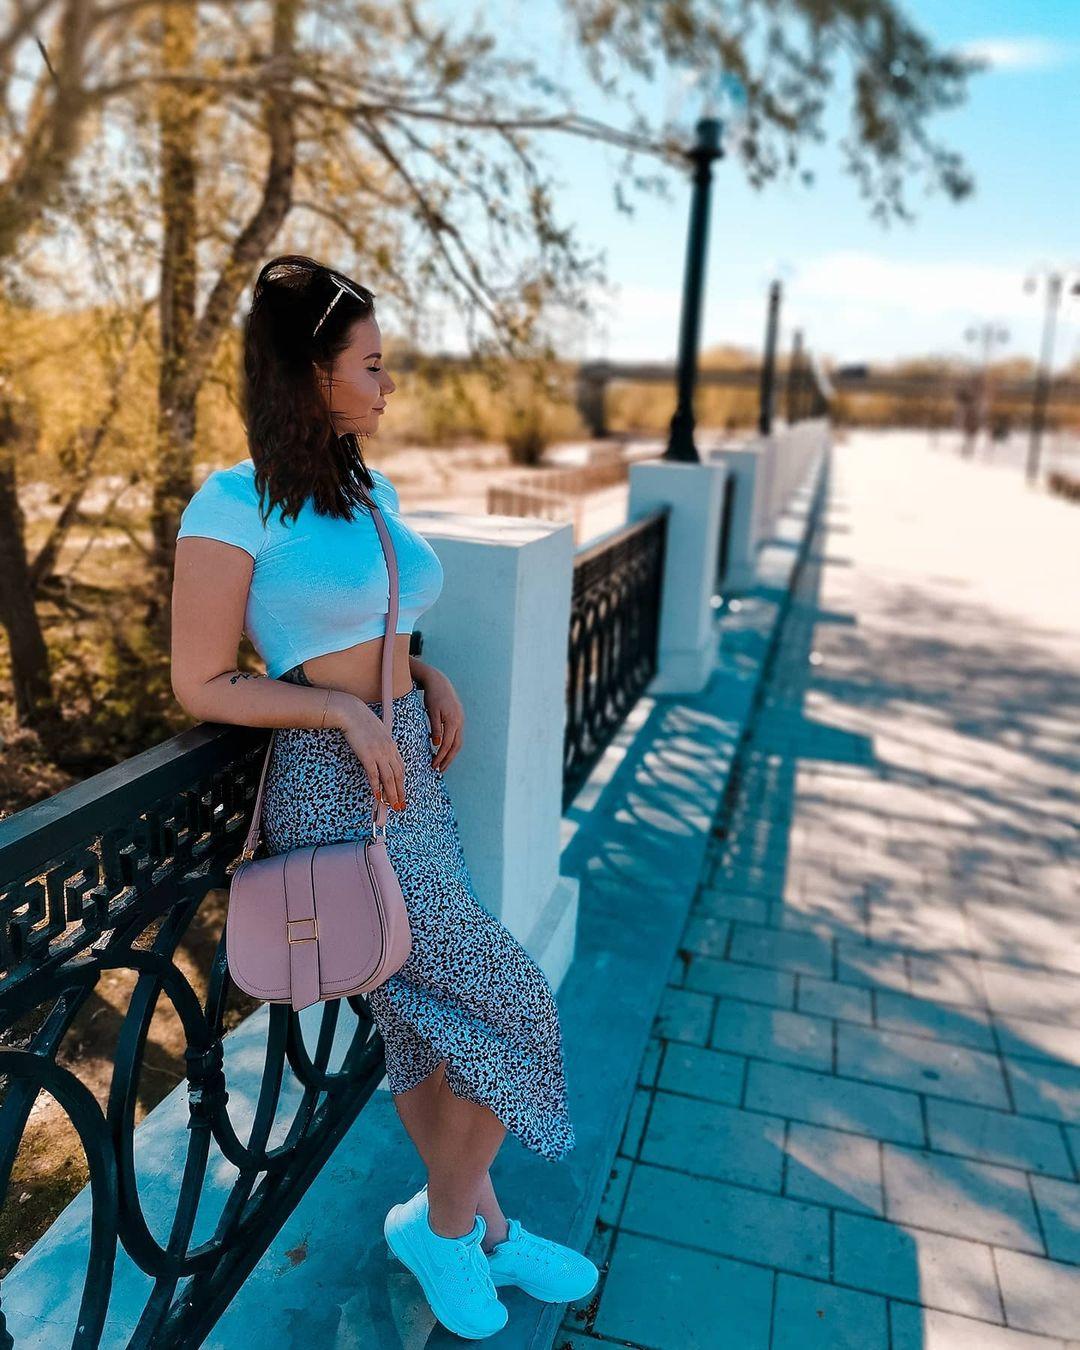 Anastasia-Nikolskaya-Wallpapers-Insta-Fit-Bio-1